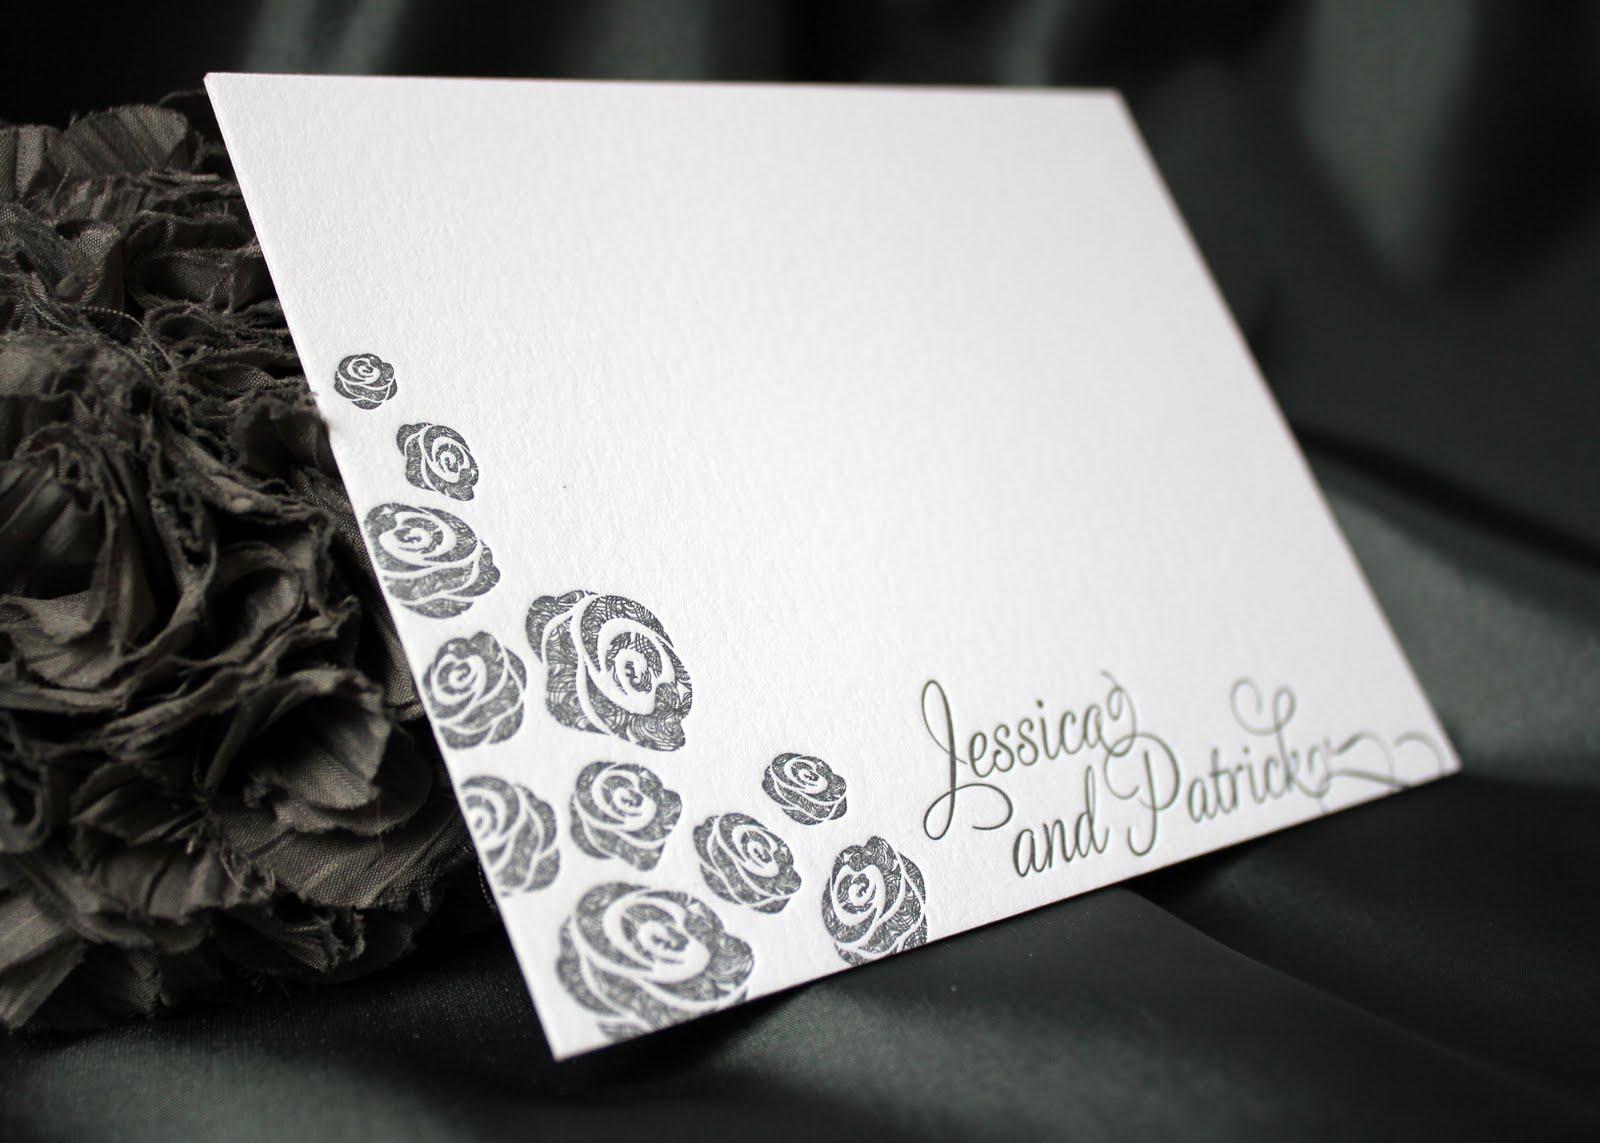 jessica + patrick. | wedding invitation ideas